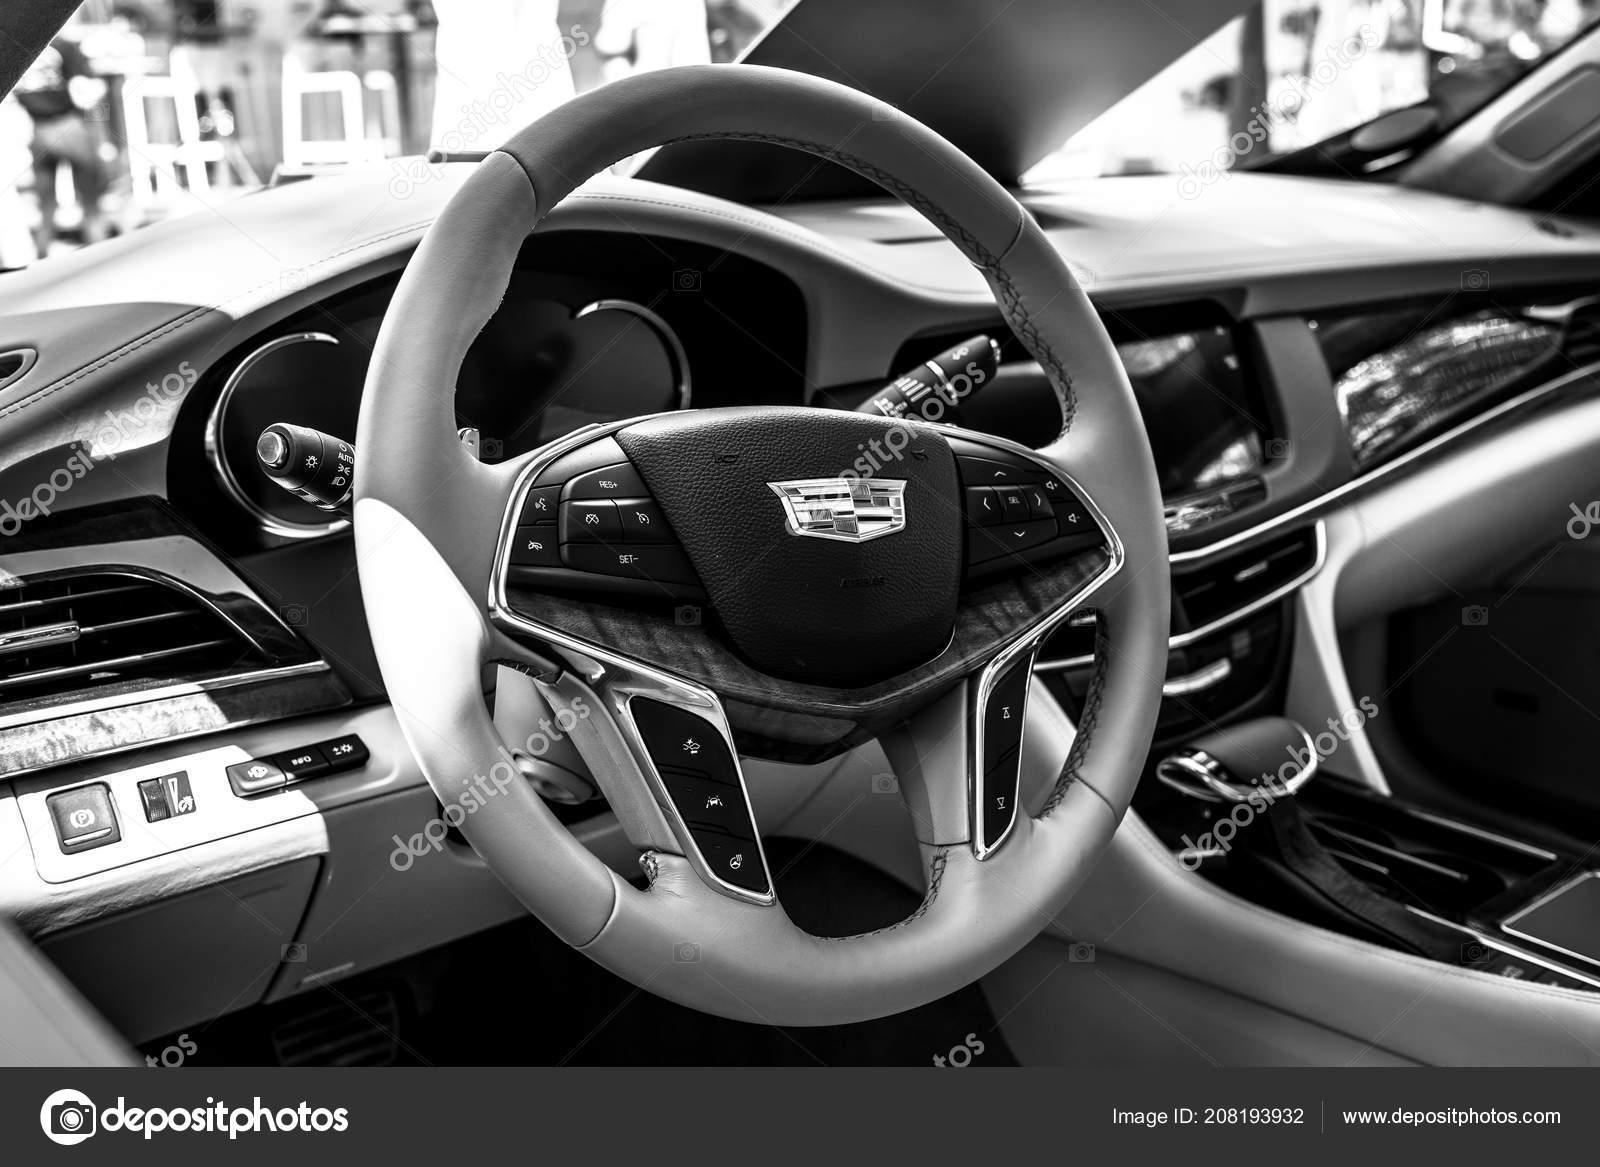 Berlin June 2018 Interior Full Size Luxury Car Cadillac Ct6 Stock